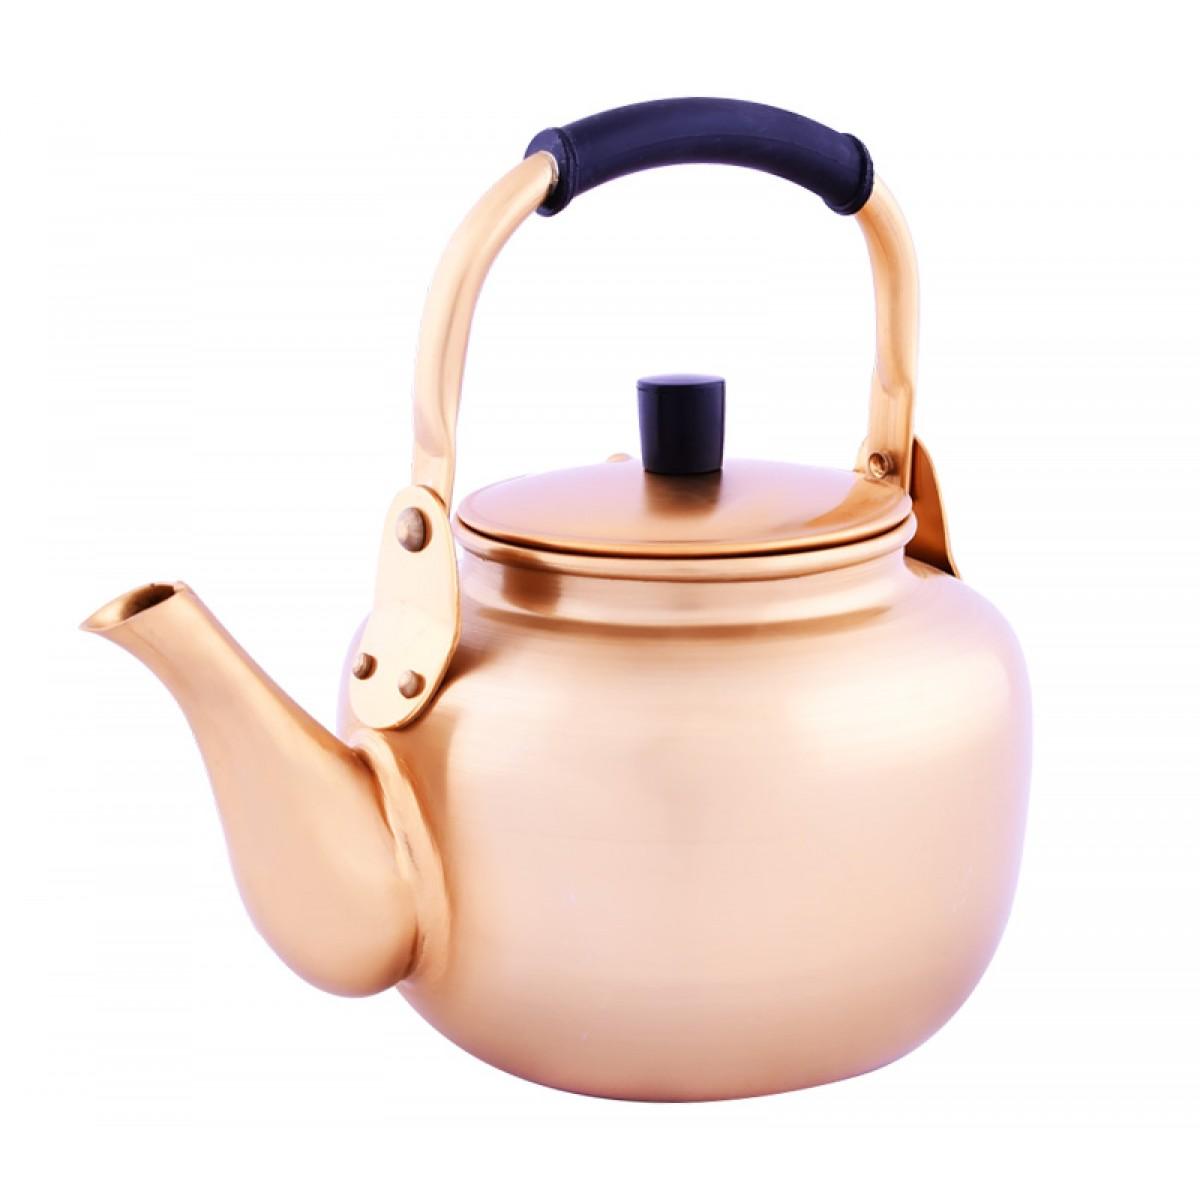 ابريق شاي معدن كوري,مقاس 3 لتر